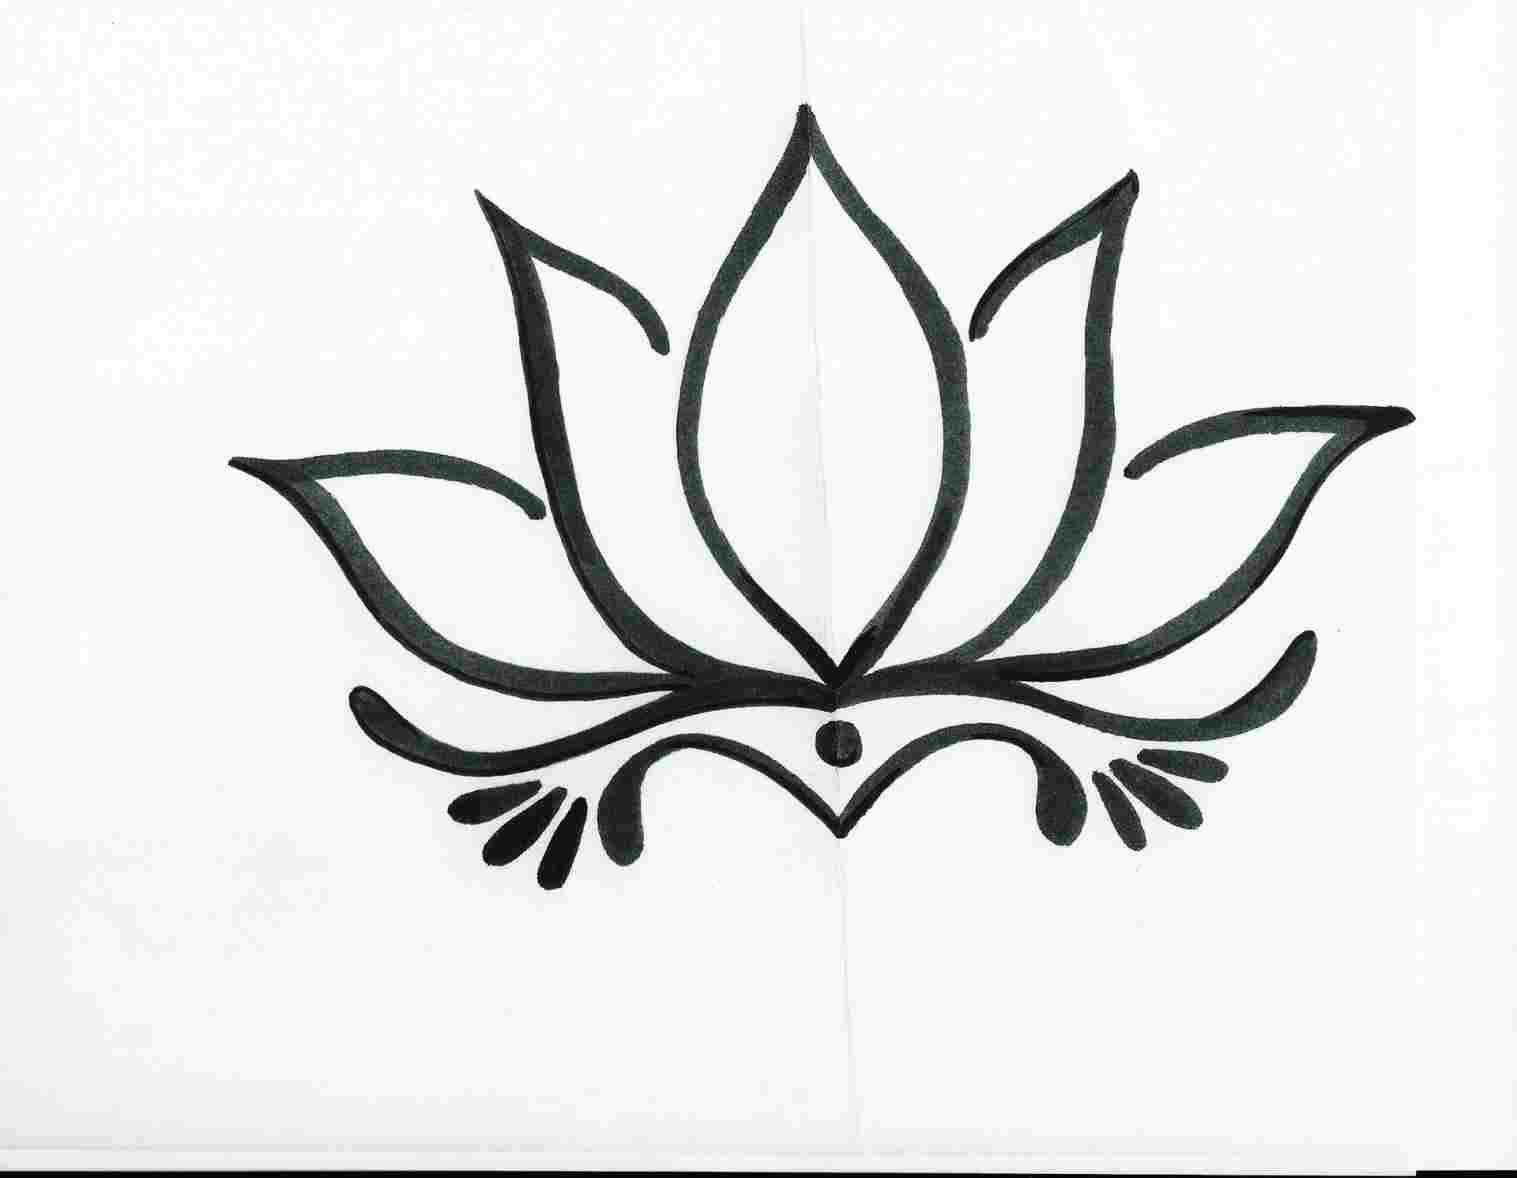 Lotus Flower Tattoo Drawing Free Download Best Lotus Flower Tattoo